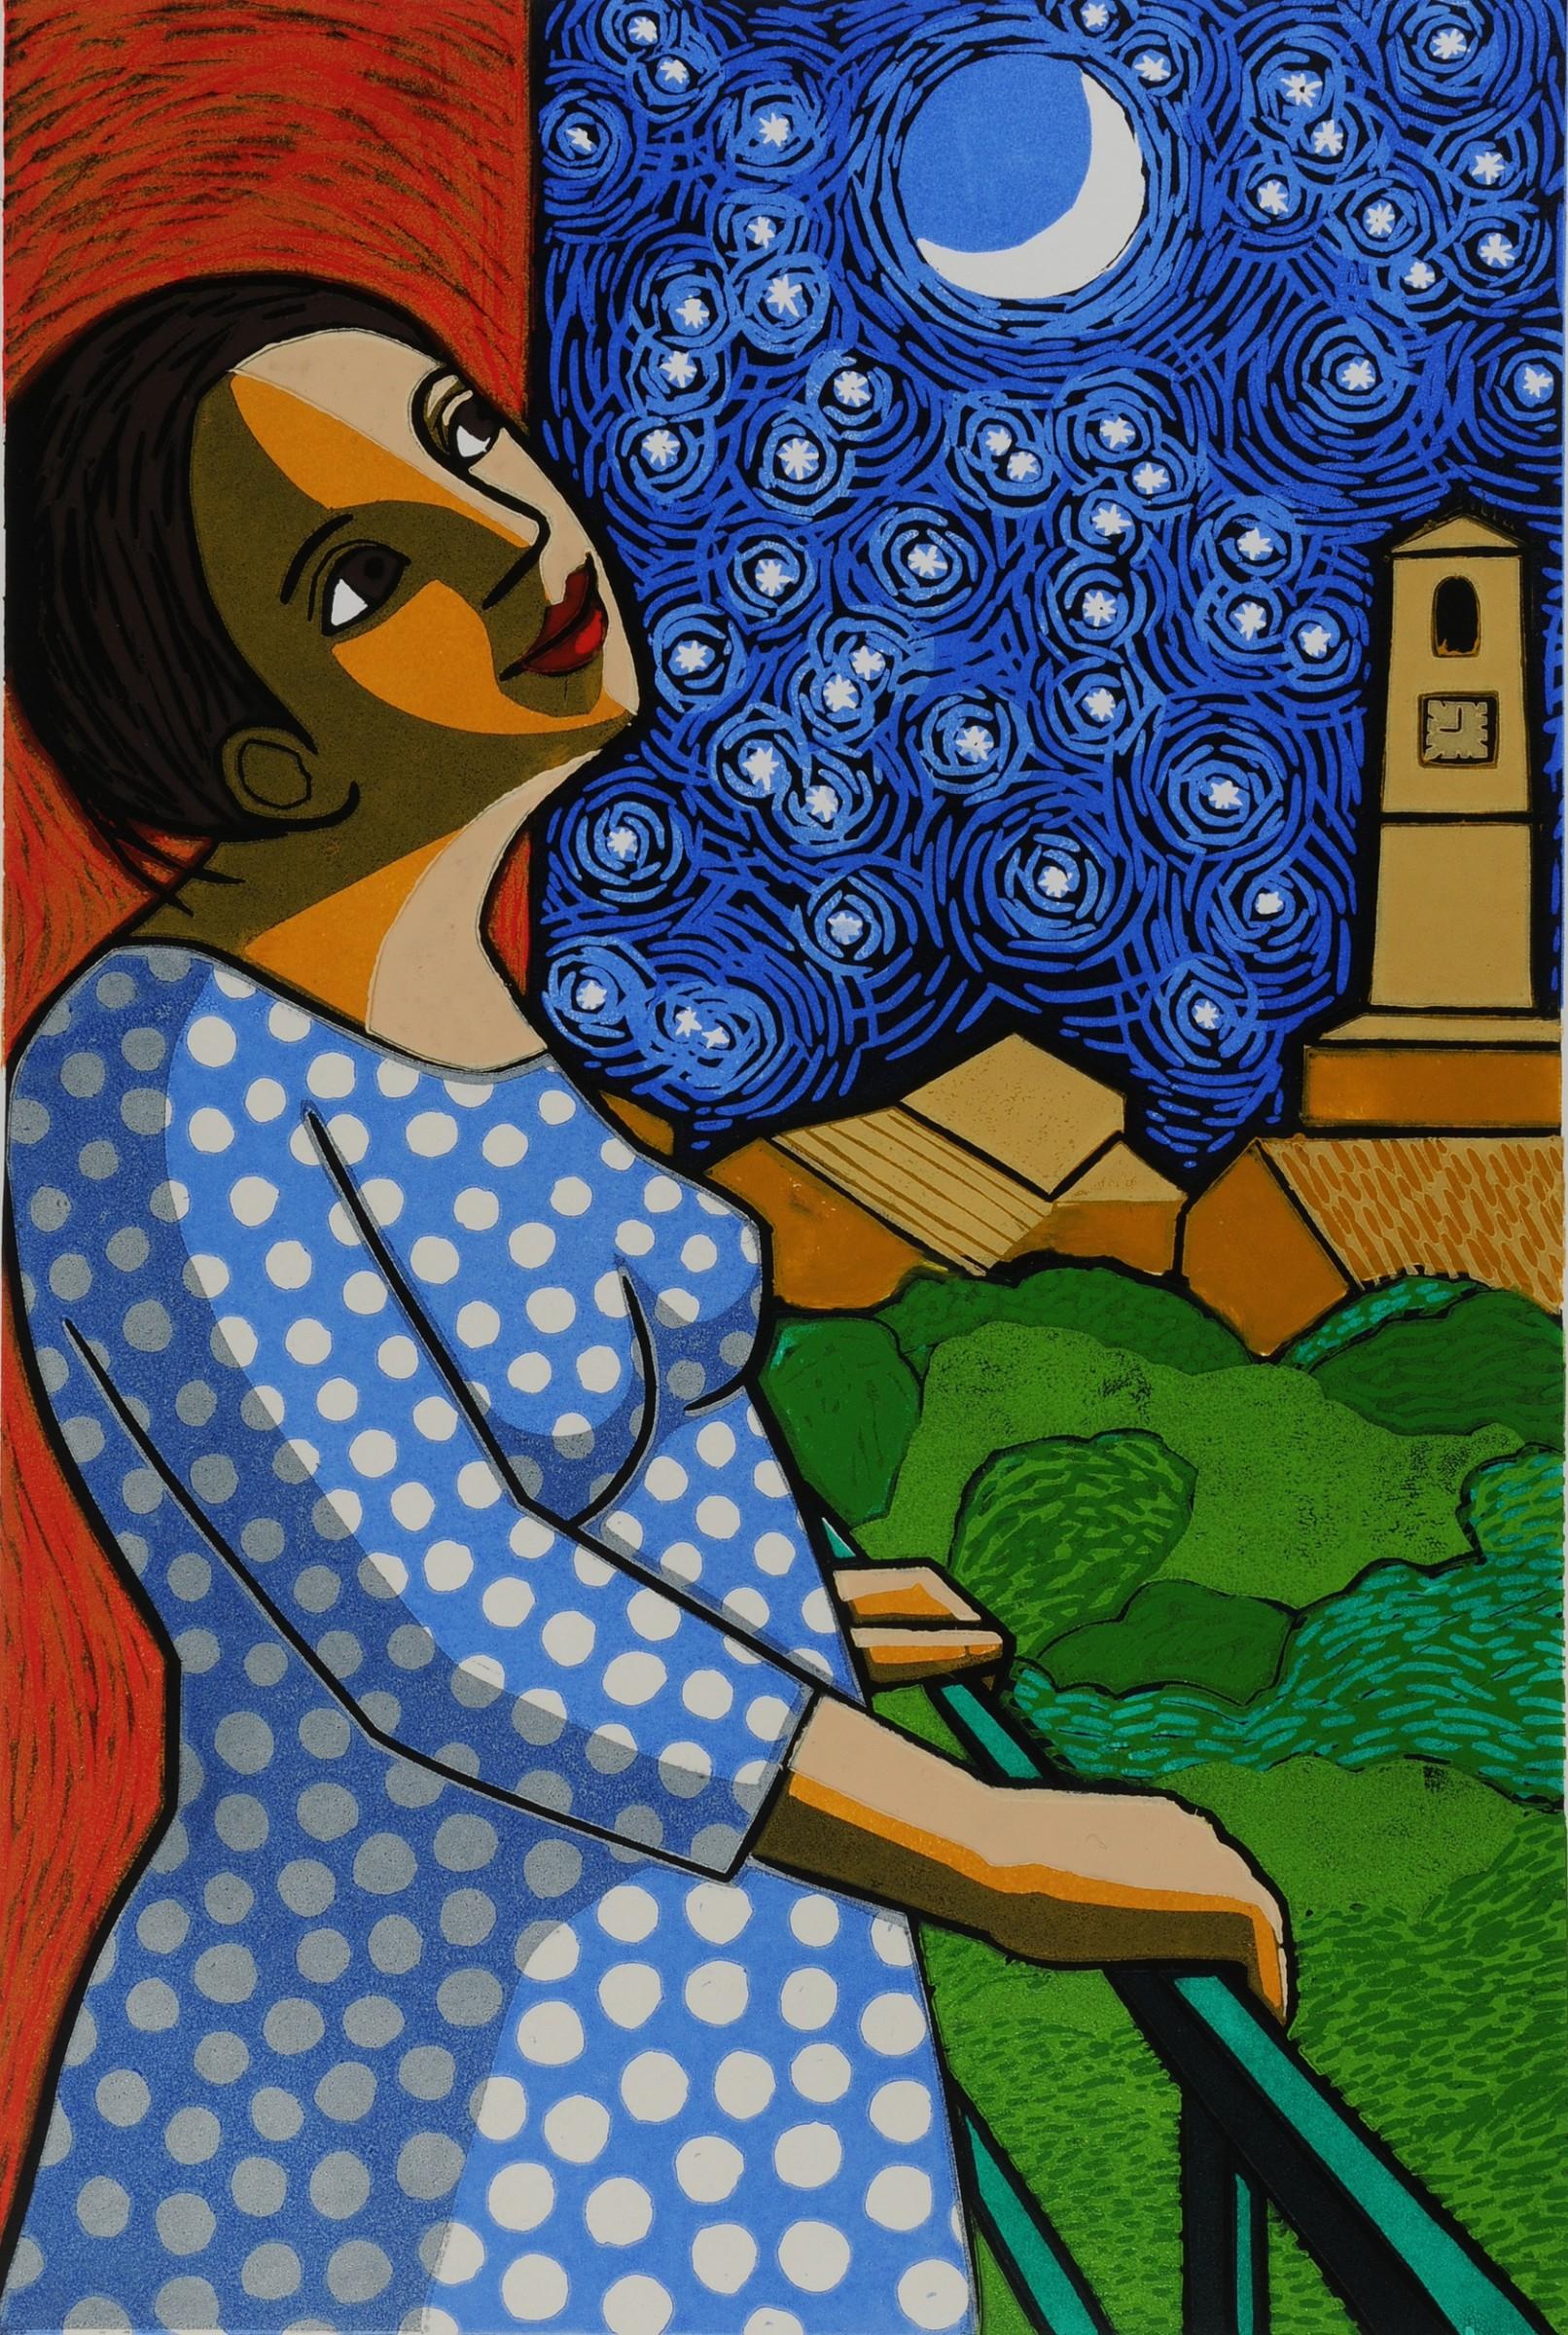 "<span class=""link fancybox-details-link""><a href=""/exhibitions/24/works/artworks_standalone11347/"">View Detail Page</a></span><div class=""artist""><span class=""artist""><strong>Anita Klein PPRE Hon RWS</strong></span></div><div class=""title""><em>Starry Night</em></div><div class=""medium"">linocut</div><div class=""dimensions"">78 x 57 cm framed size<br>60 x 40 cm image size</div><div class=""edition_details"">edition of 50</div>"